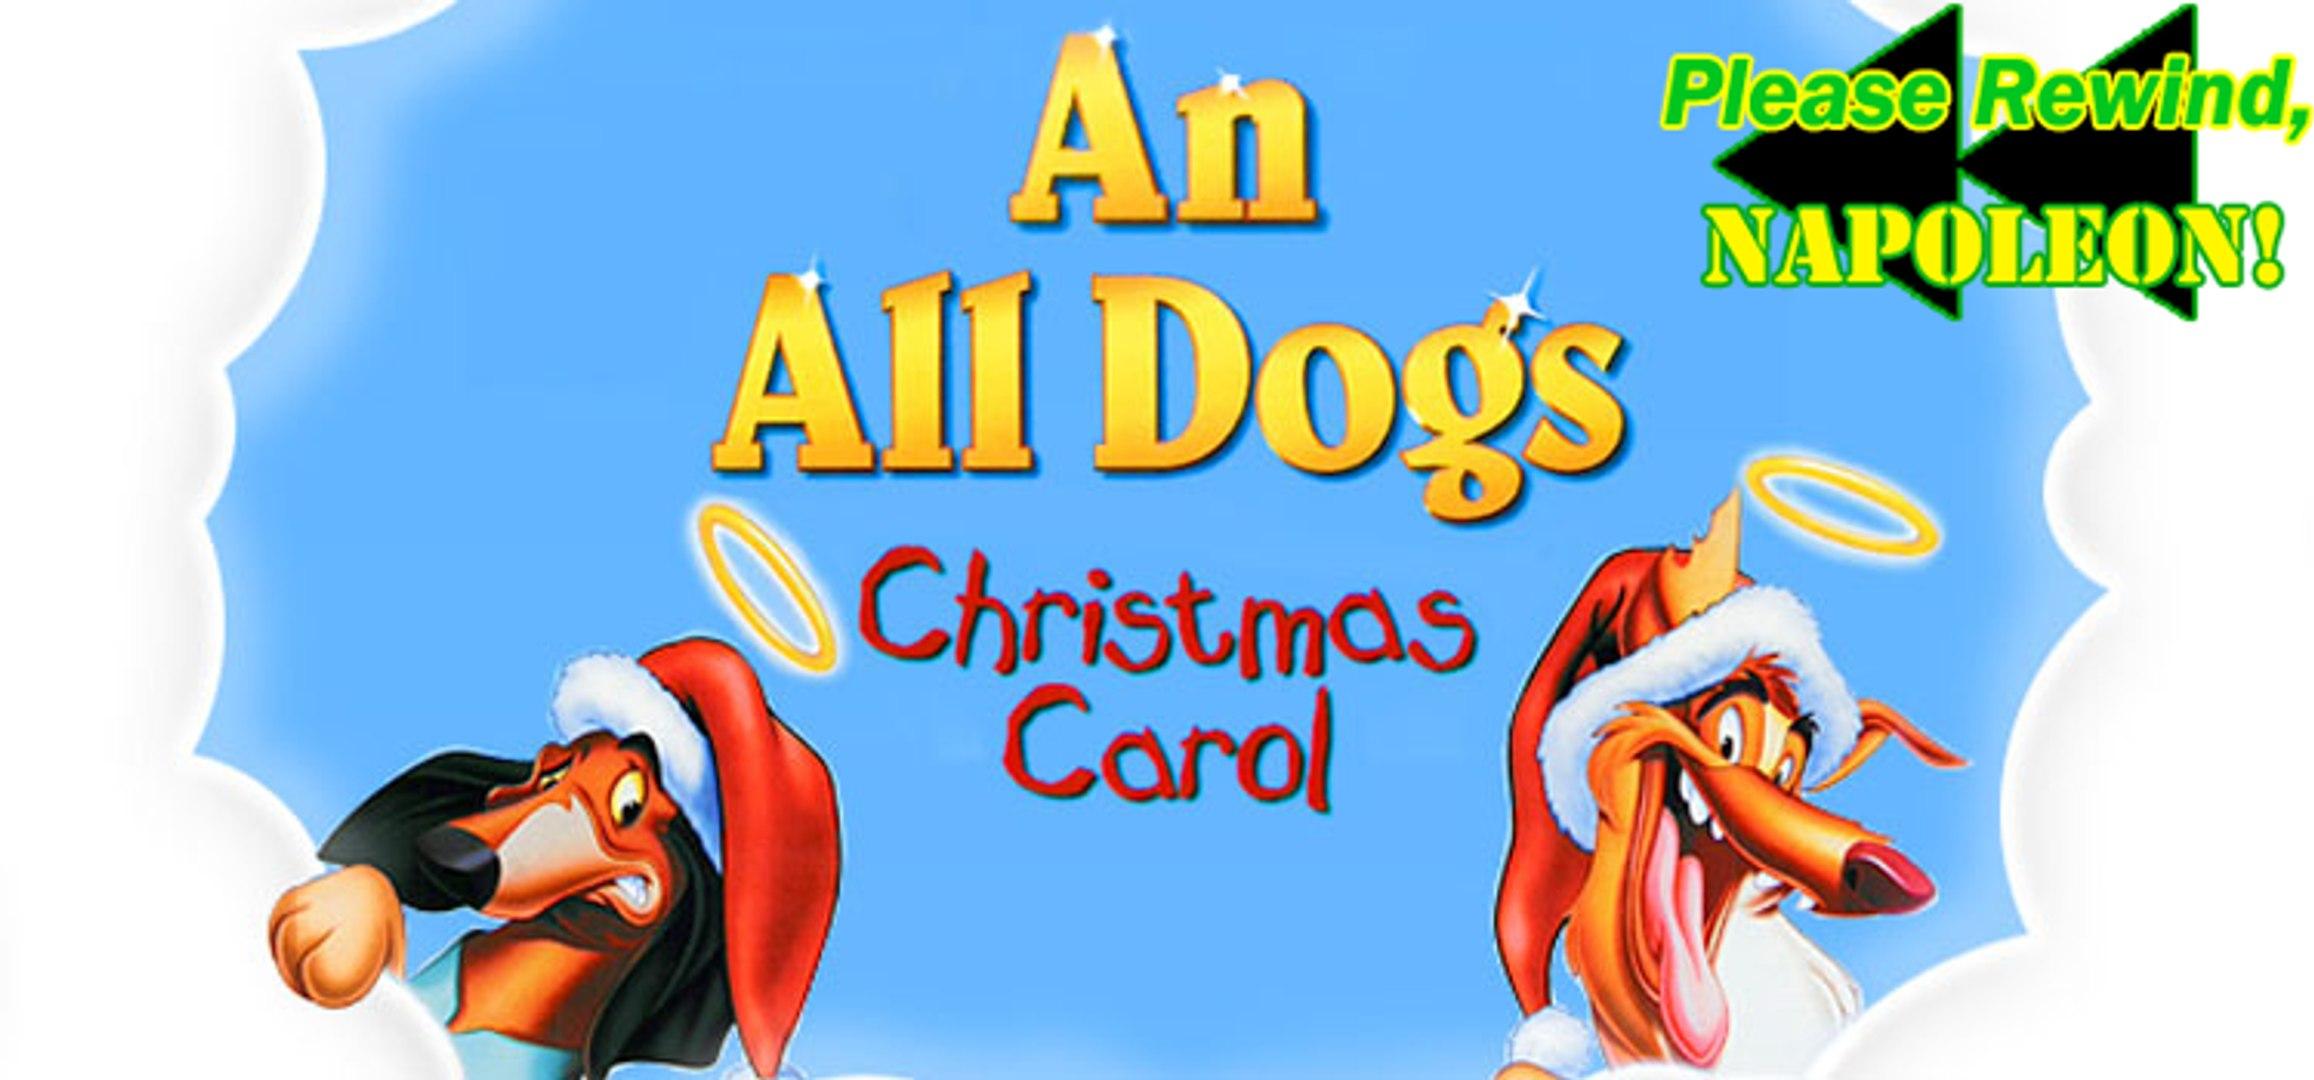 An All Dogs Christmas Carol.Please Rewind Napoleon An All Dogs Christmas Carol